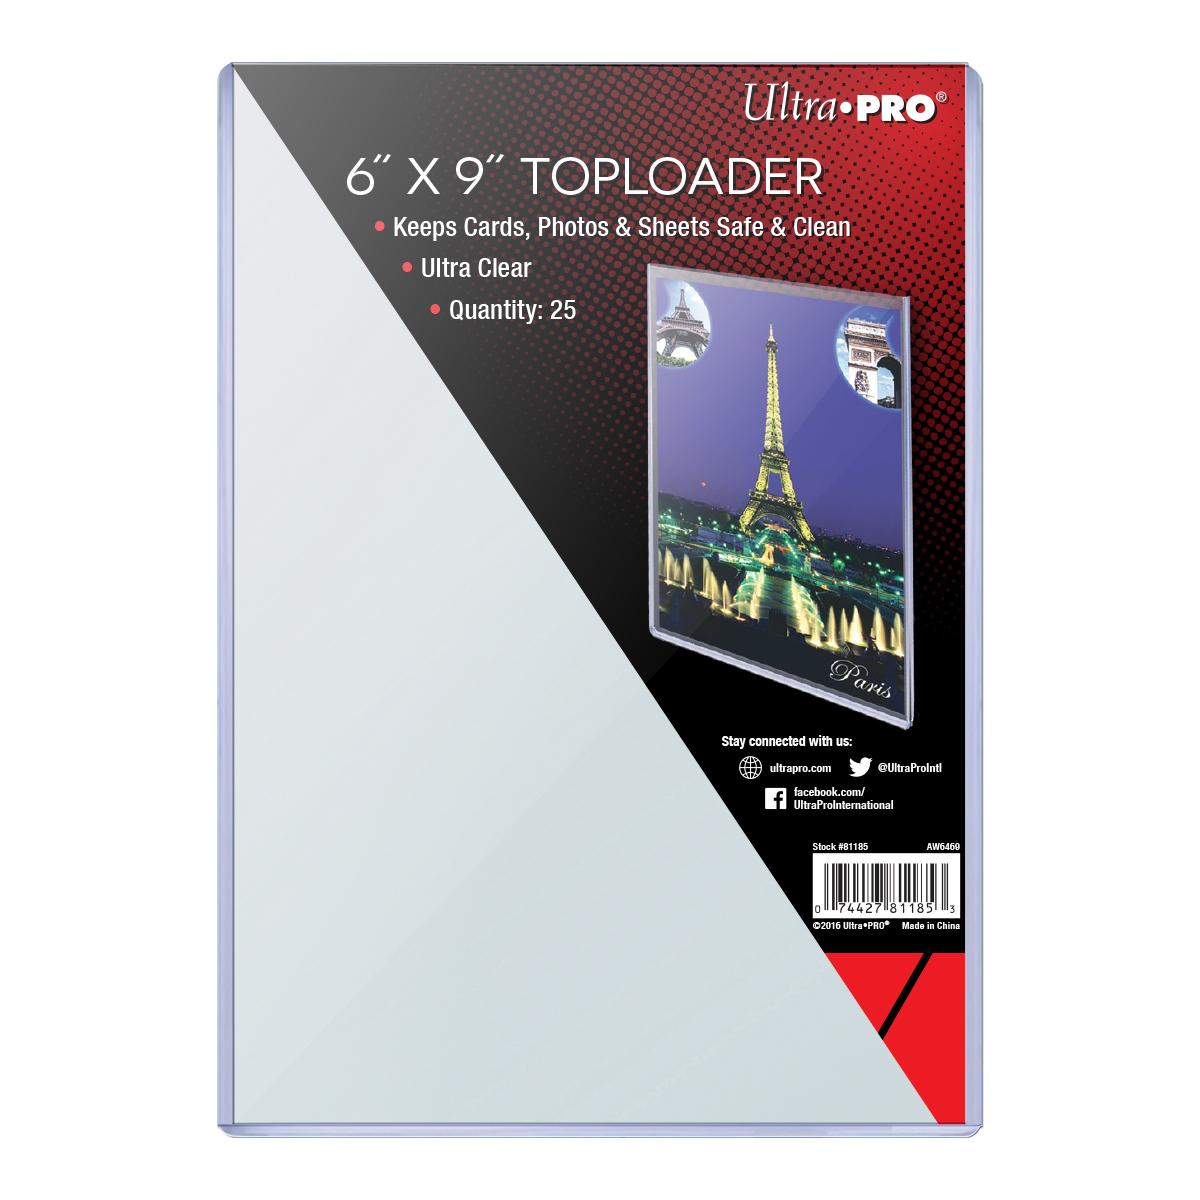 "6"" X 9"" Toploader 25ct, Ultra PRO"